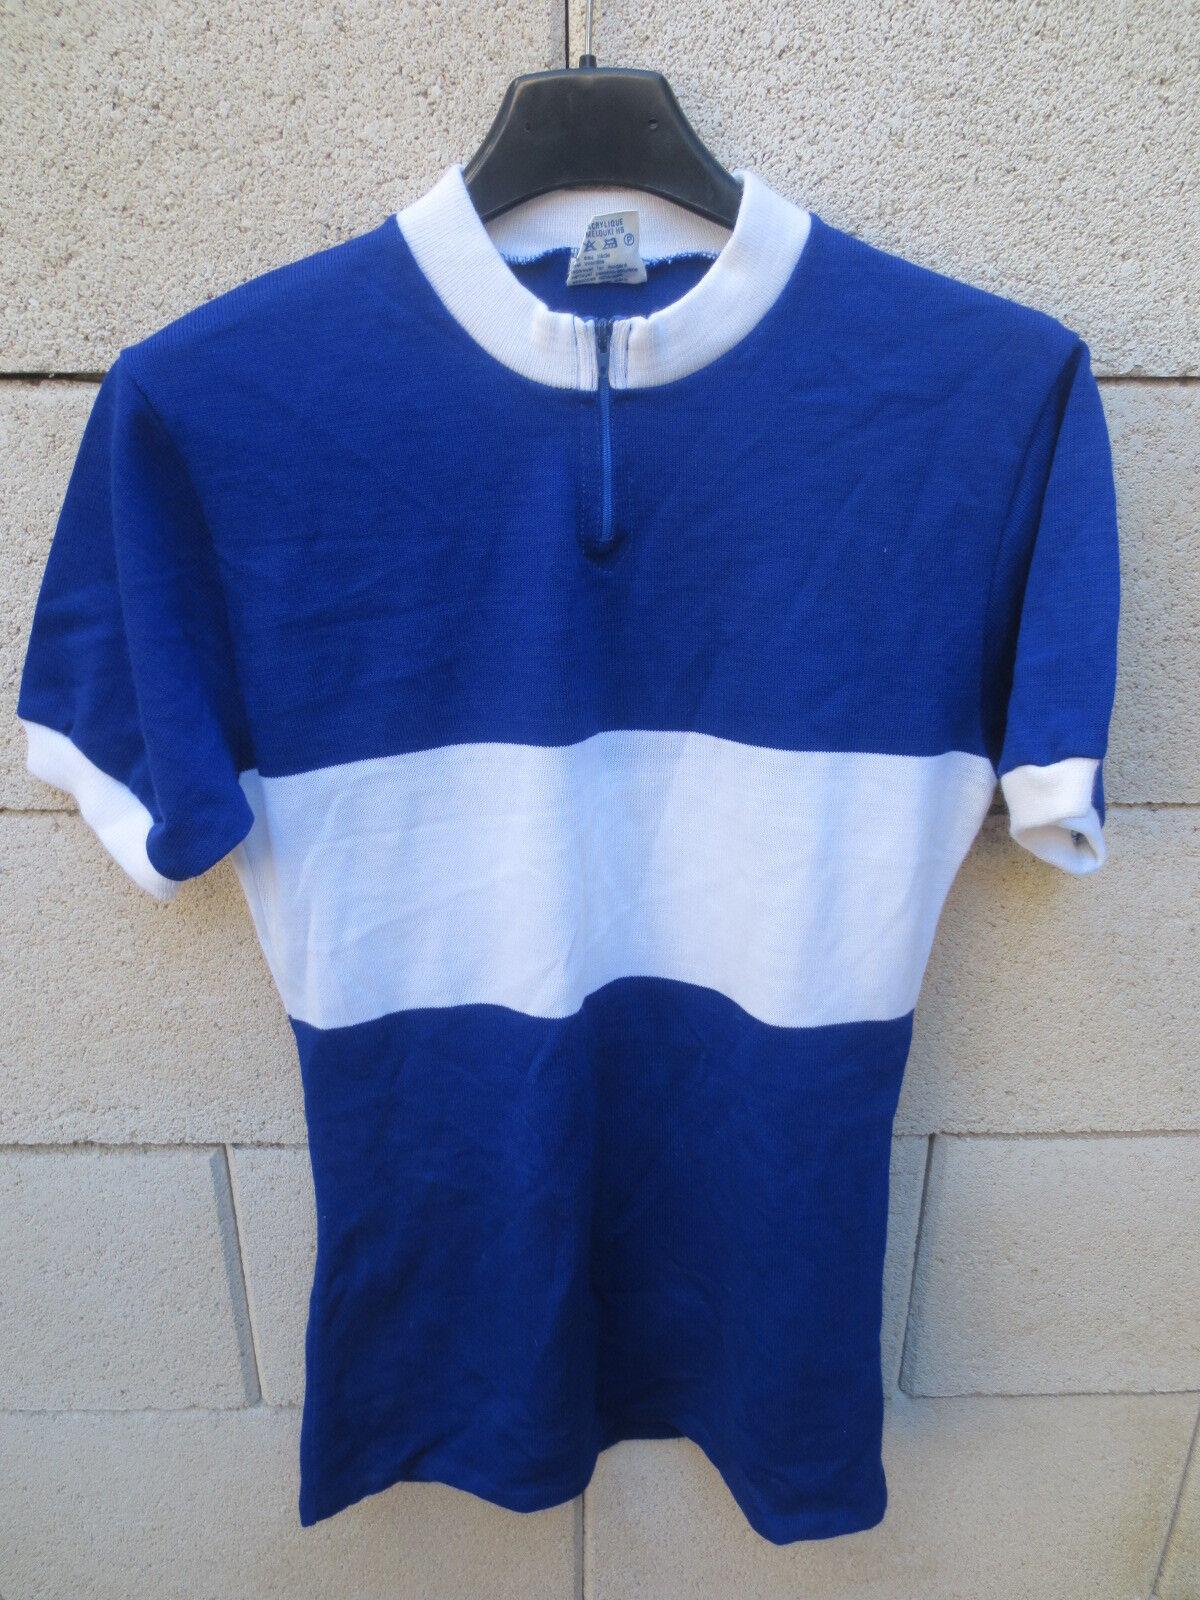 VINTAGE Maillot cycliste KOPA HEURTEFEU made in France années 70 blue jersey 2 S